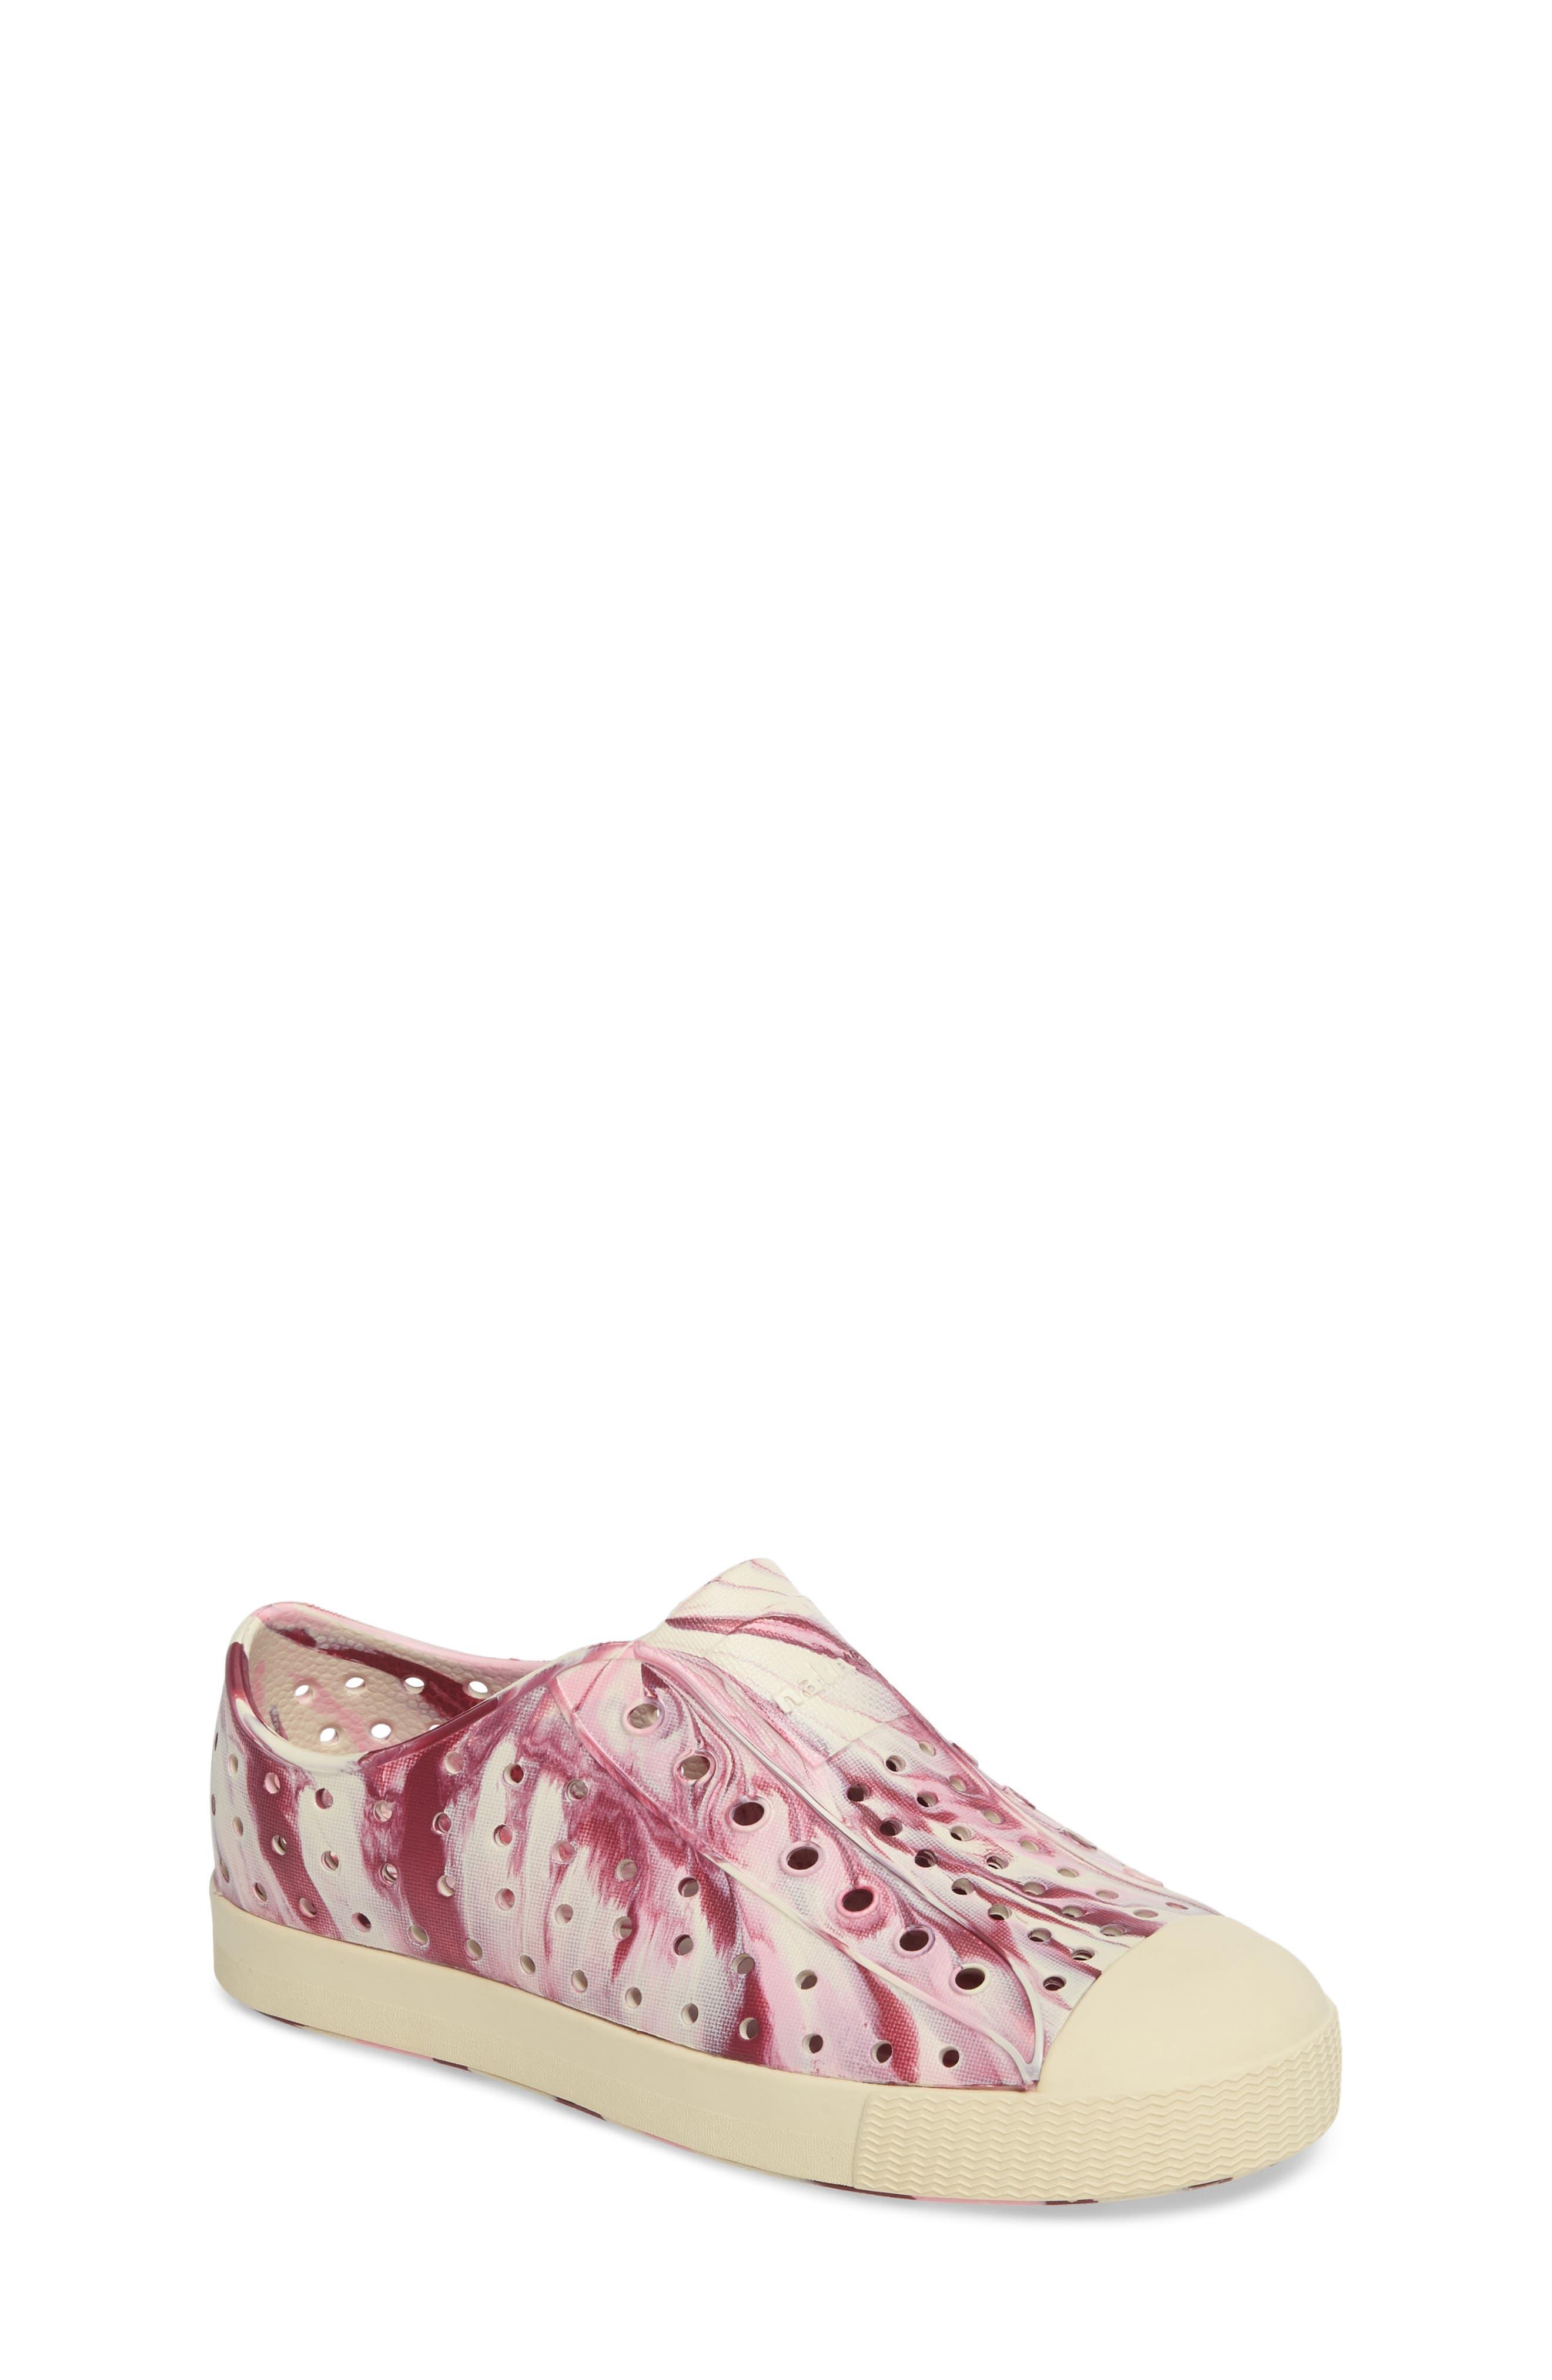 Alternate Image 1 Selected - Native Shoes Jefferson - Marbled Perforated Slip-On (Walker, Toddler & Little Kid)